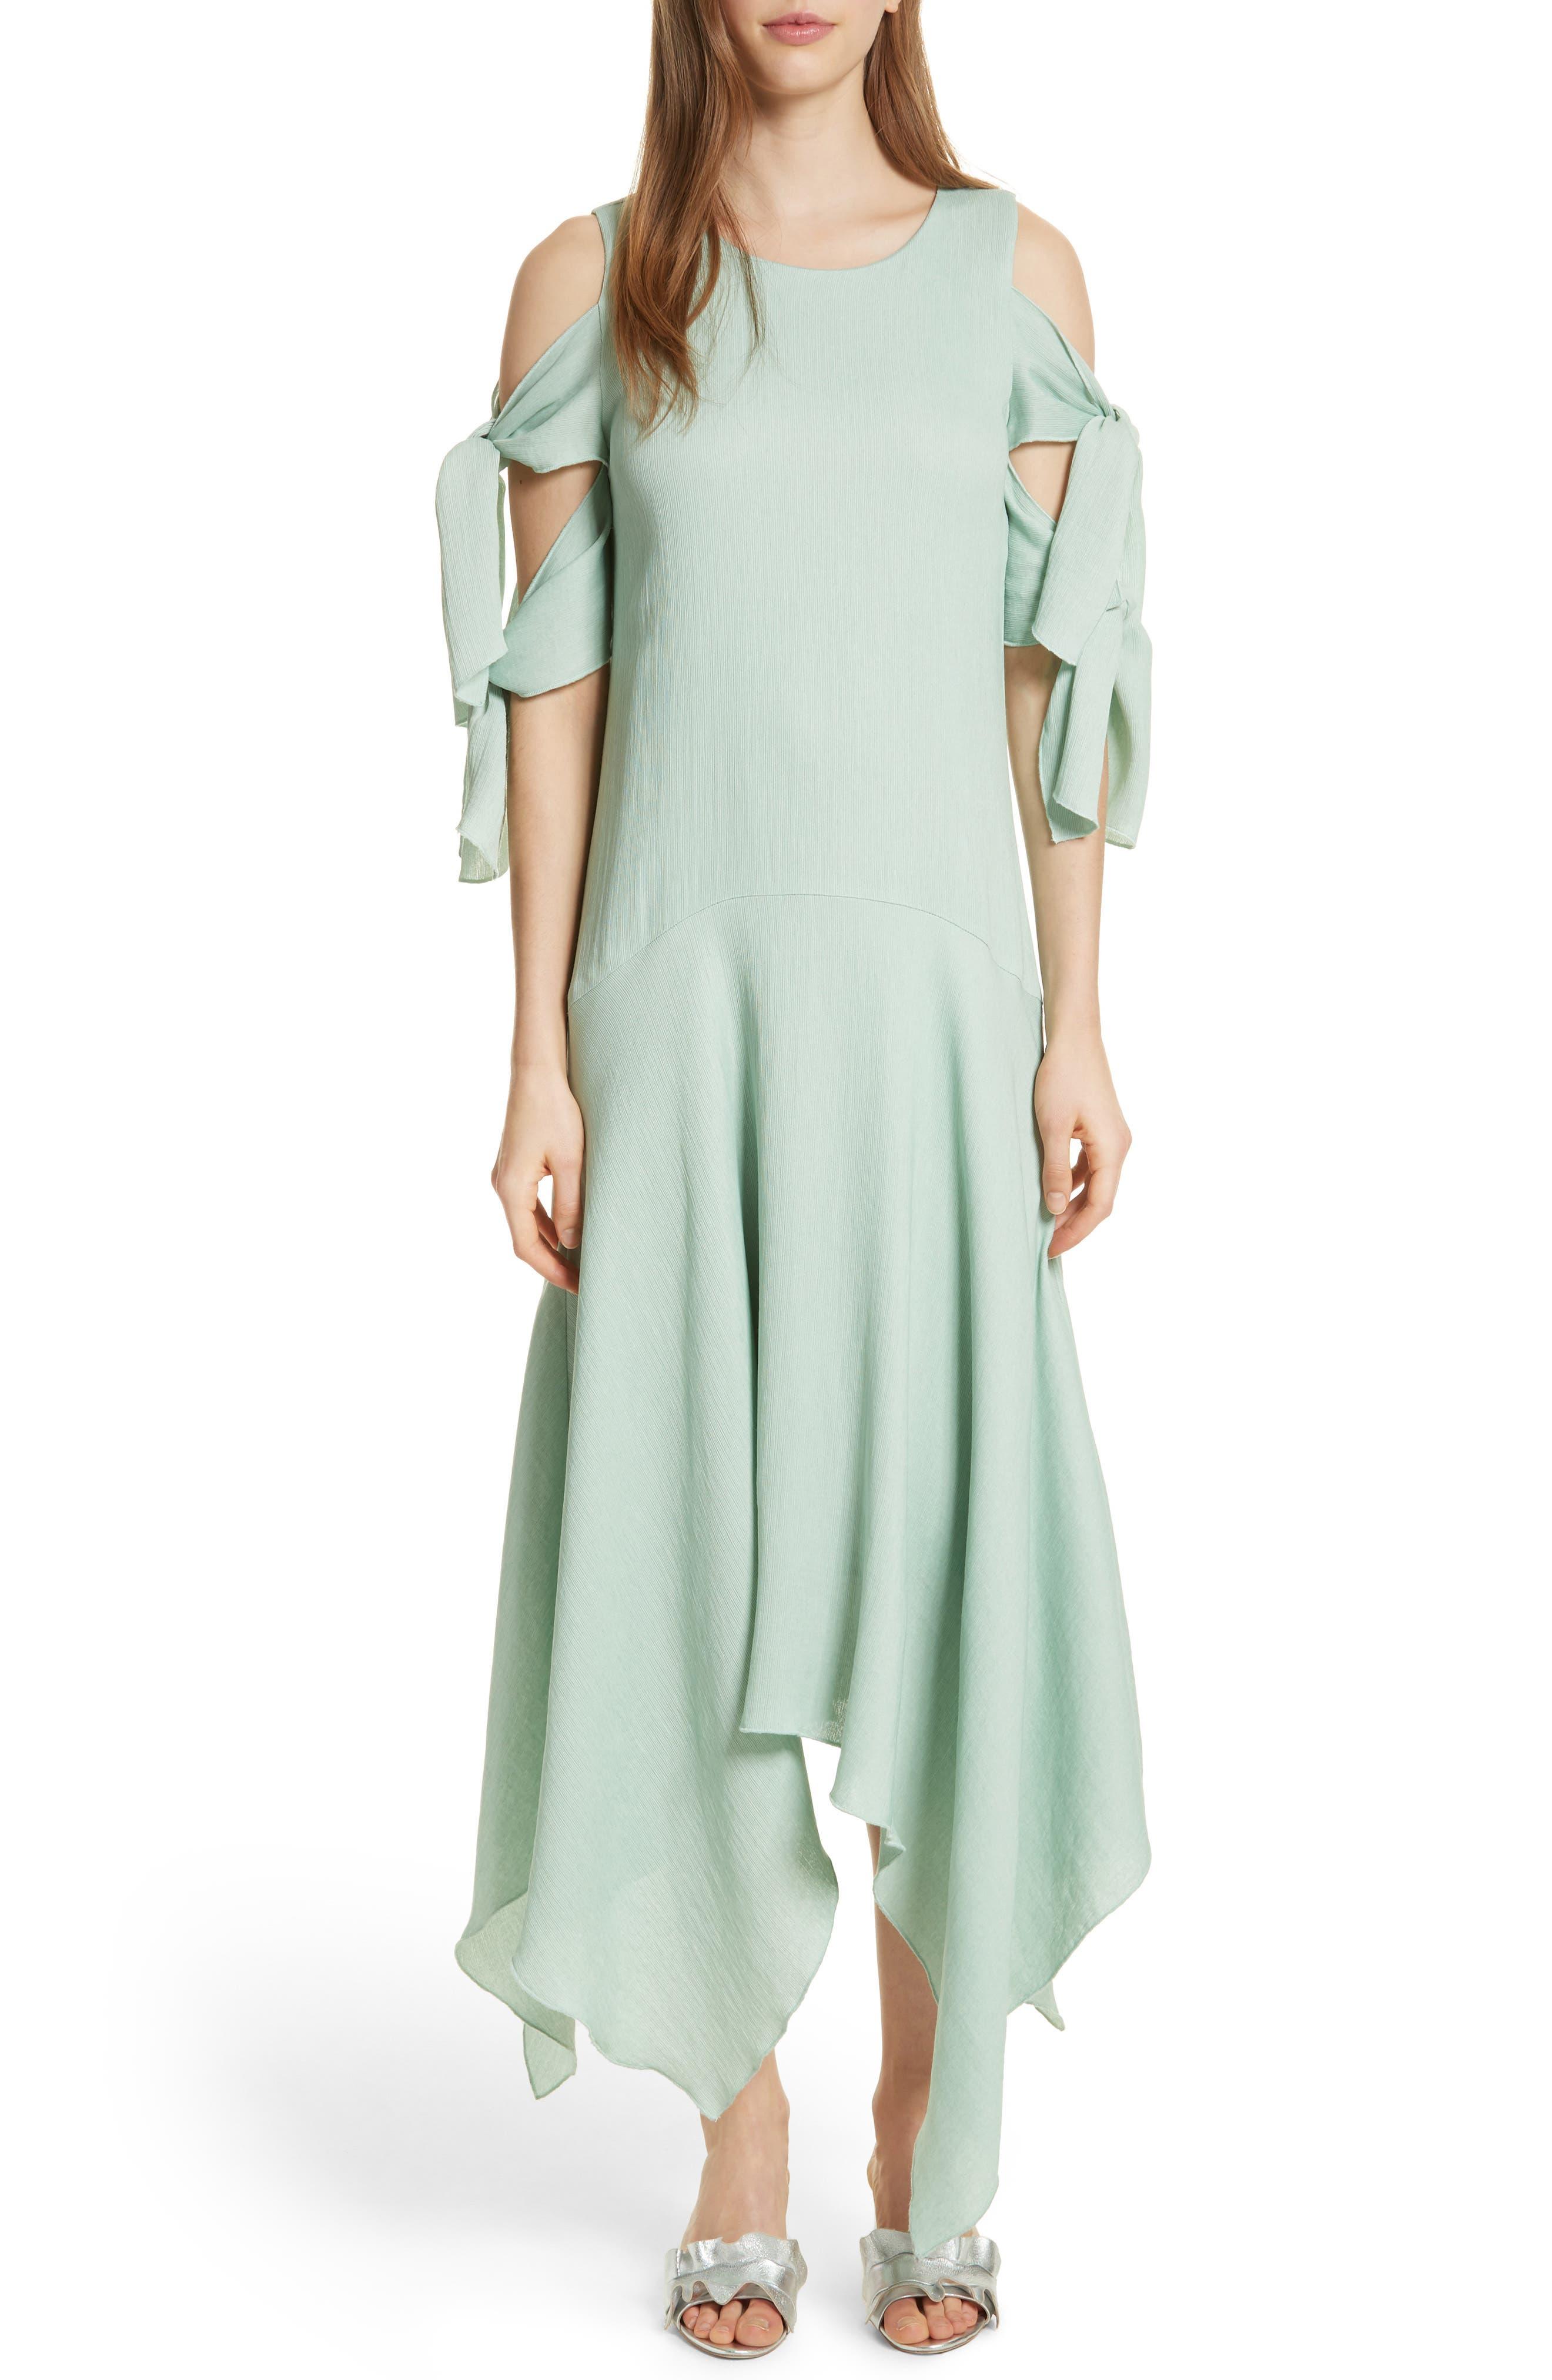 Prose & Poetry Vivianna Drop Waist Midi Dress,                         Main,                         color, Aqua Foam